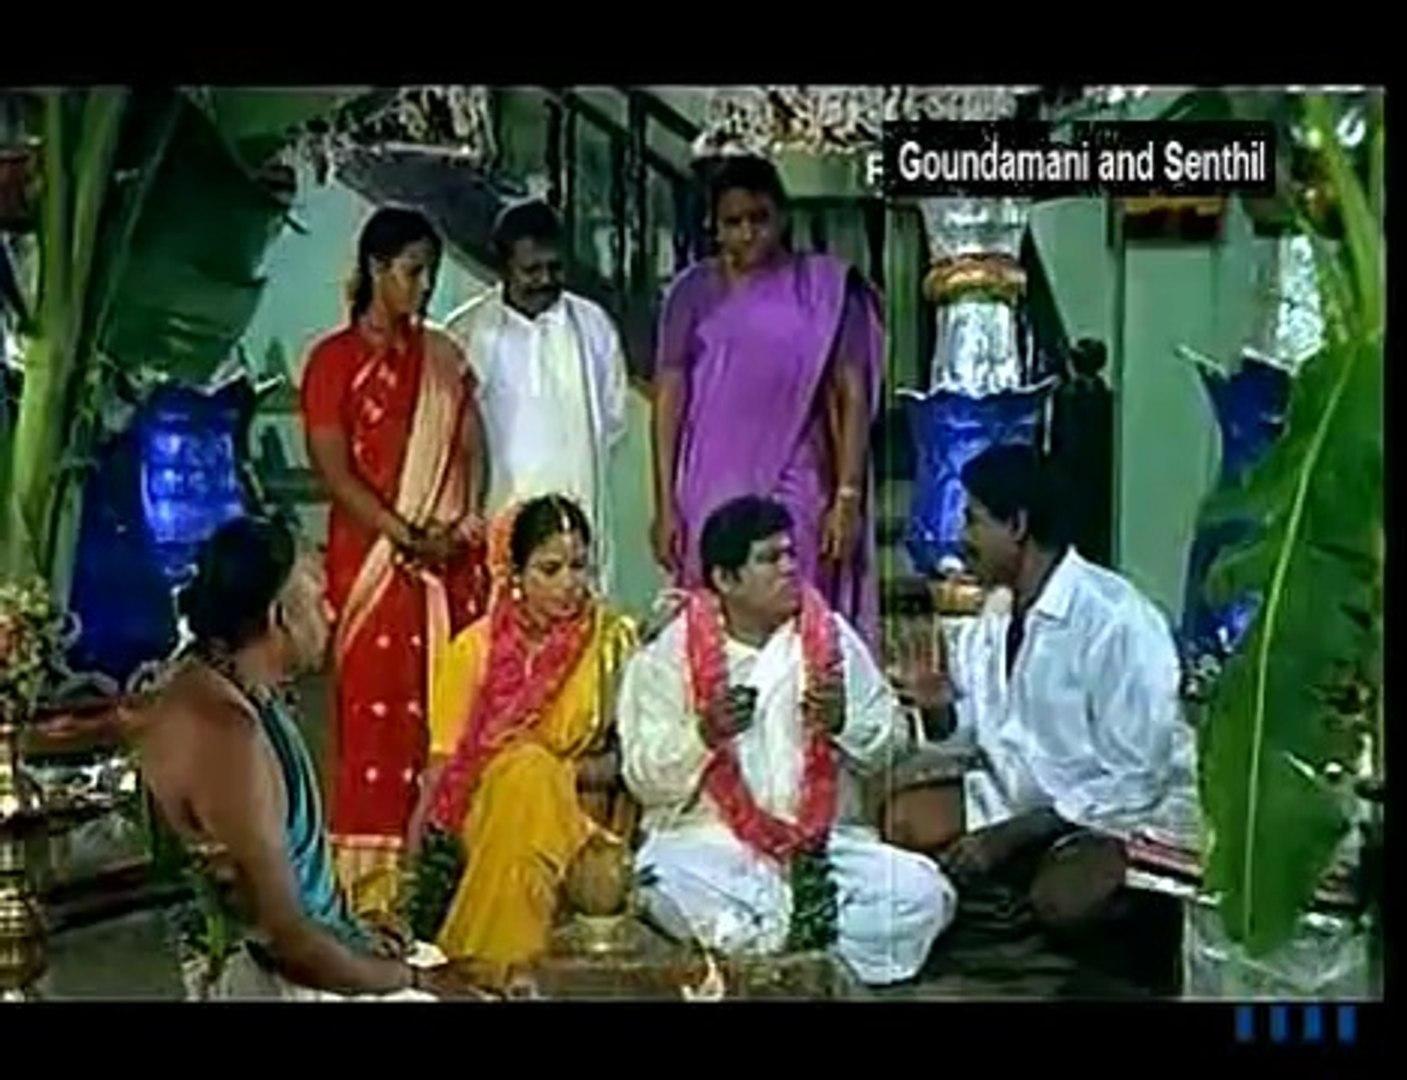 otta kalana comedy - Goundamani senthil Comedy